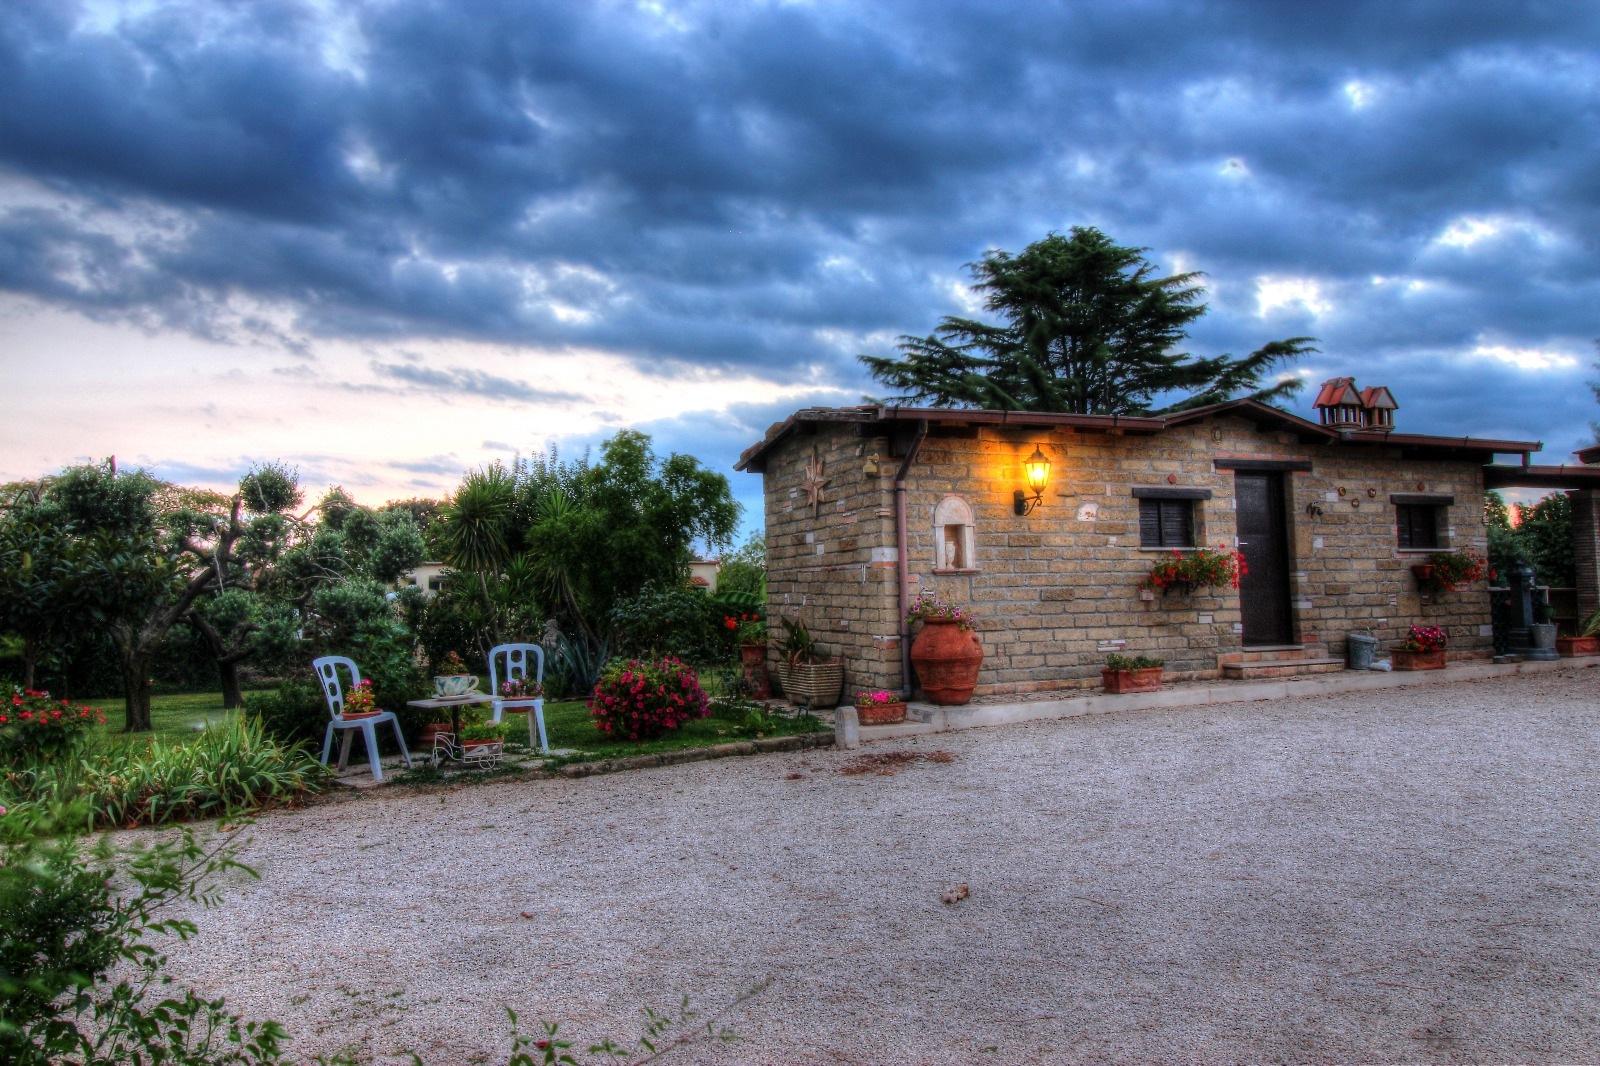 Countryside  by Eddy Chirizzi